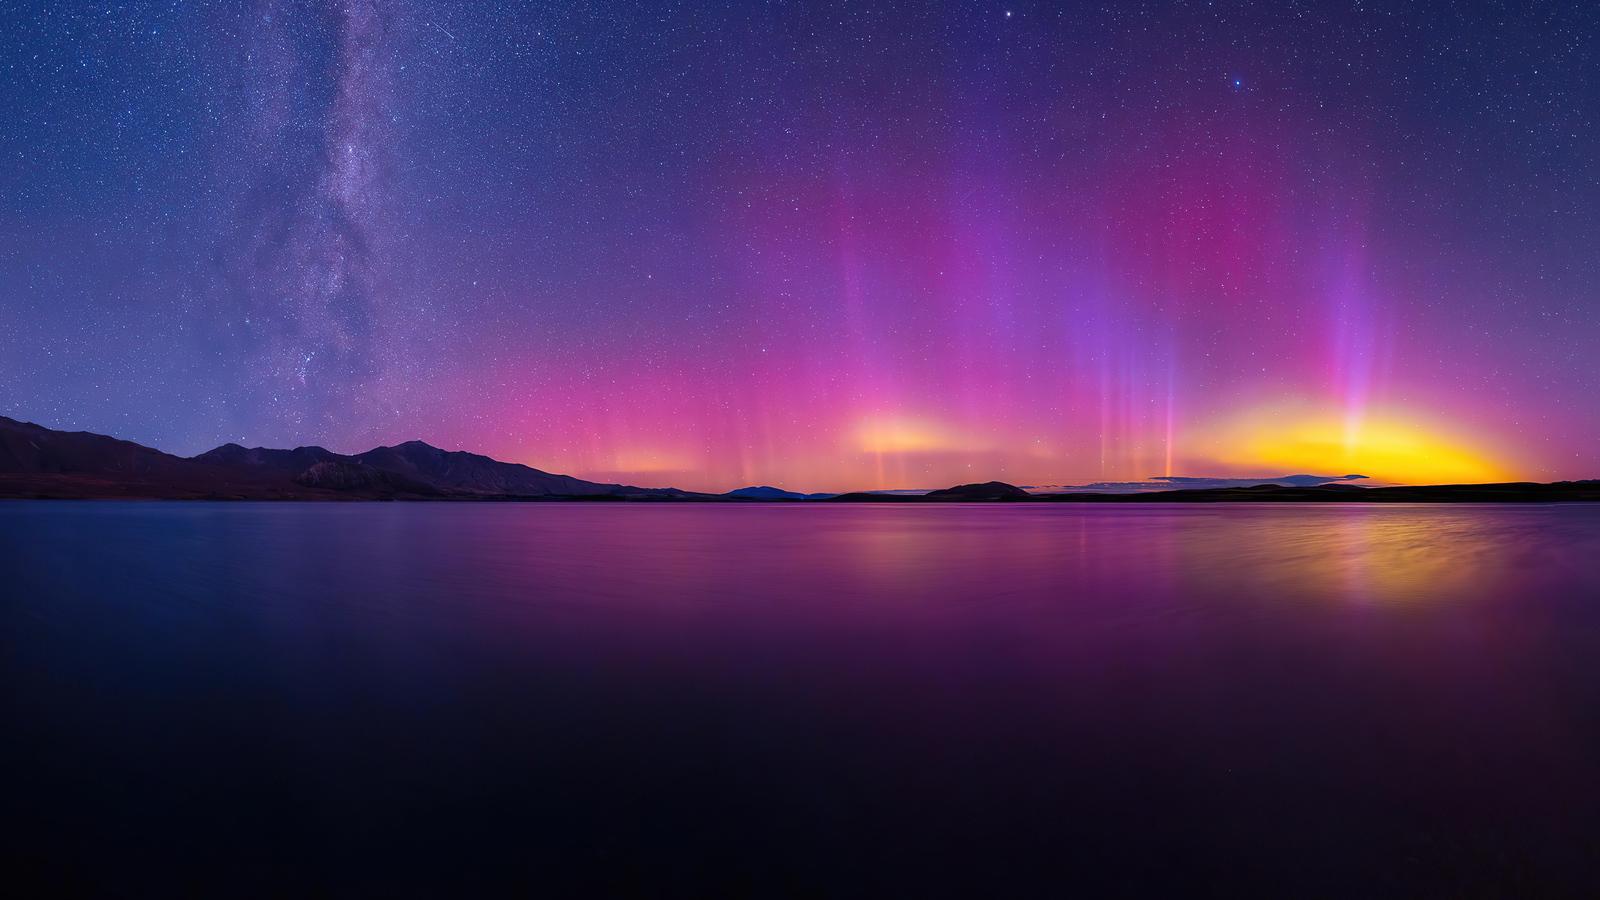 aurorare-landscape-8k-ra.jpg